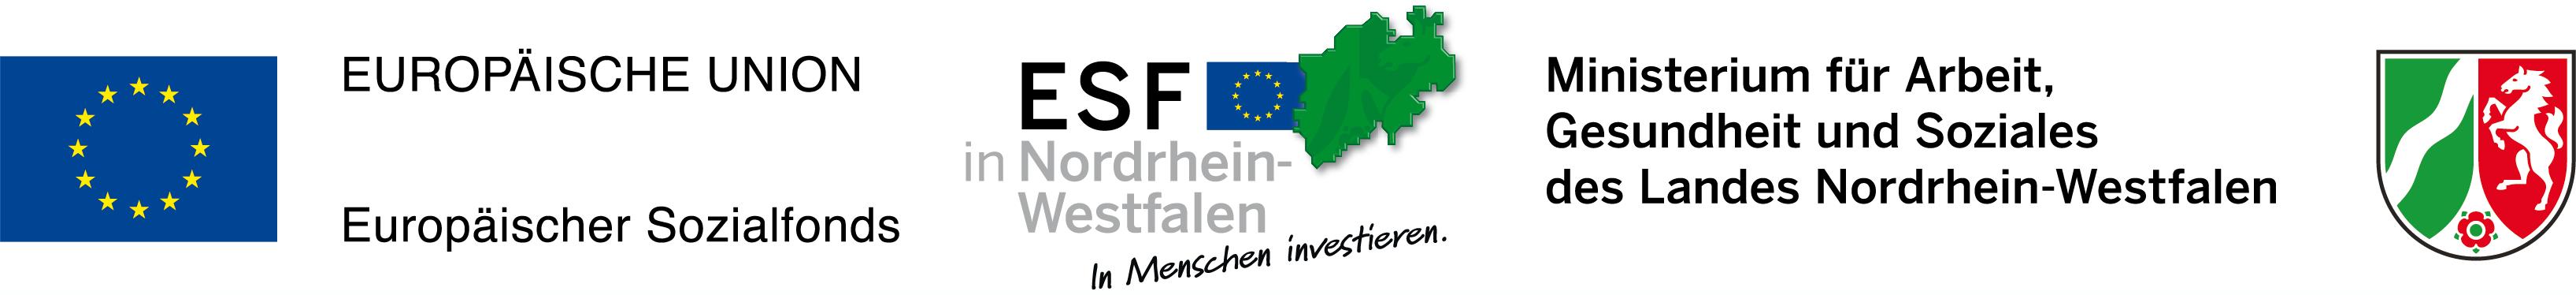 eu_esf-nrw_mags_4c-logo